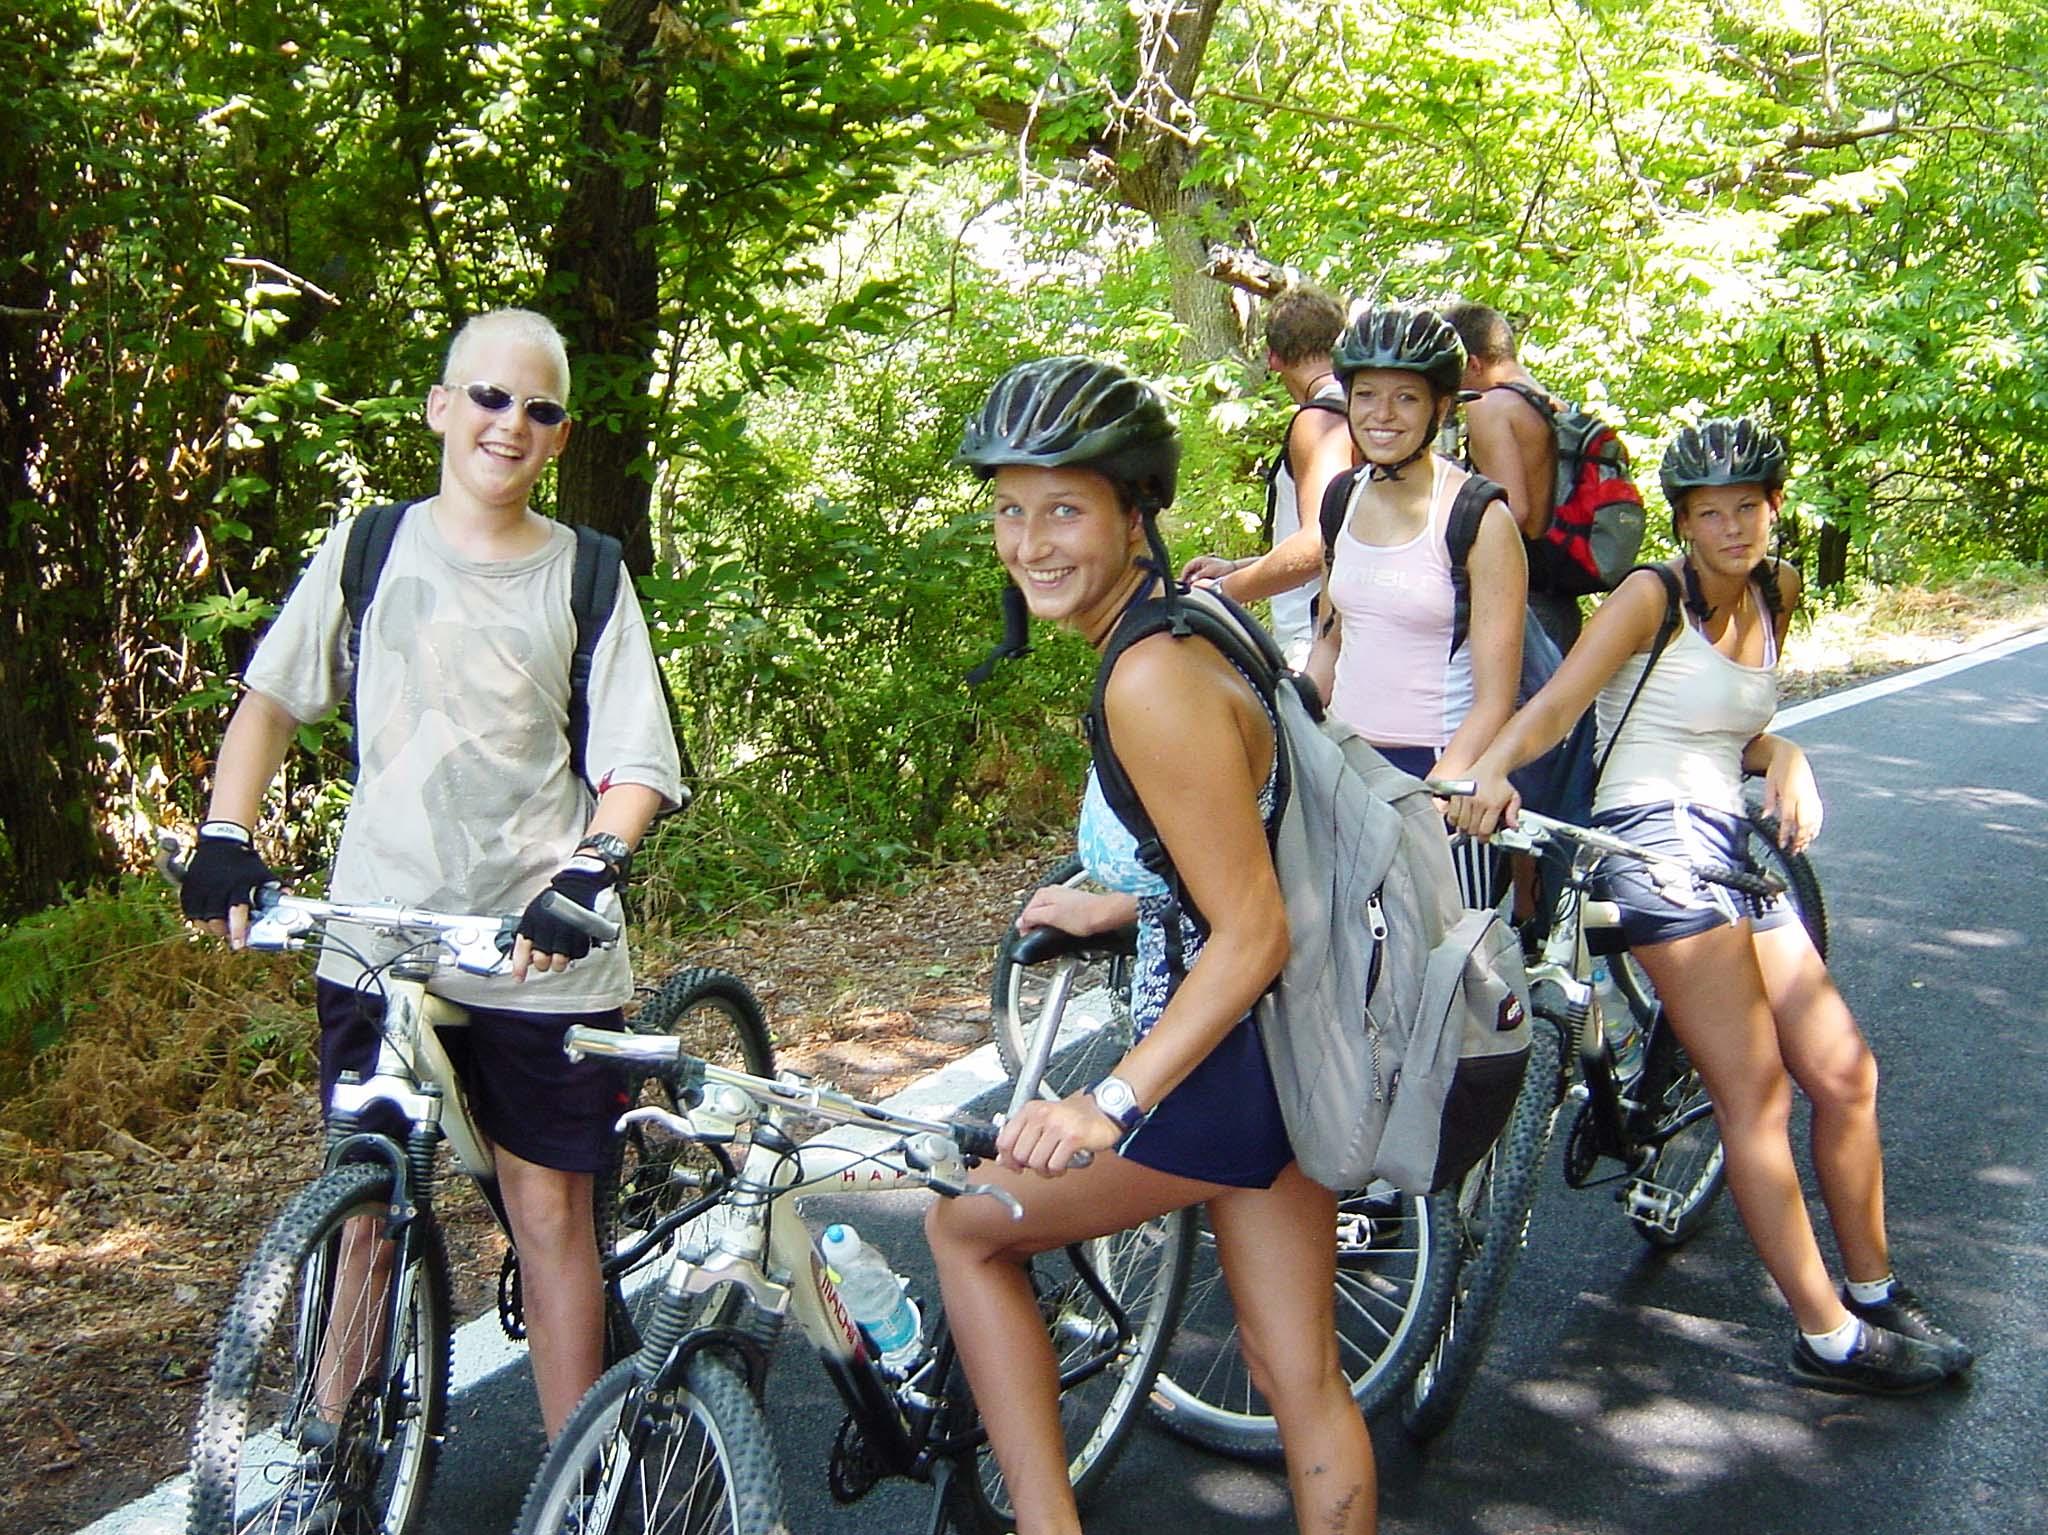 Fahrradtouren auf Klassenfahrt